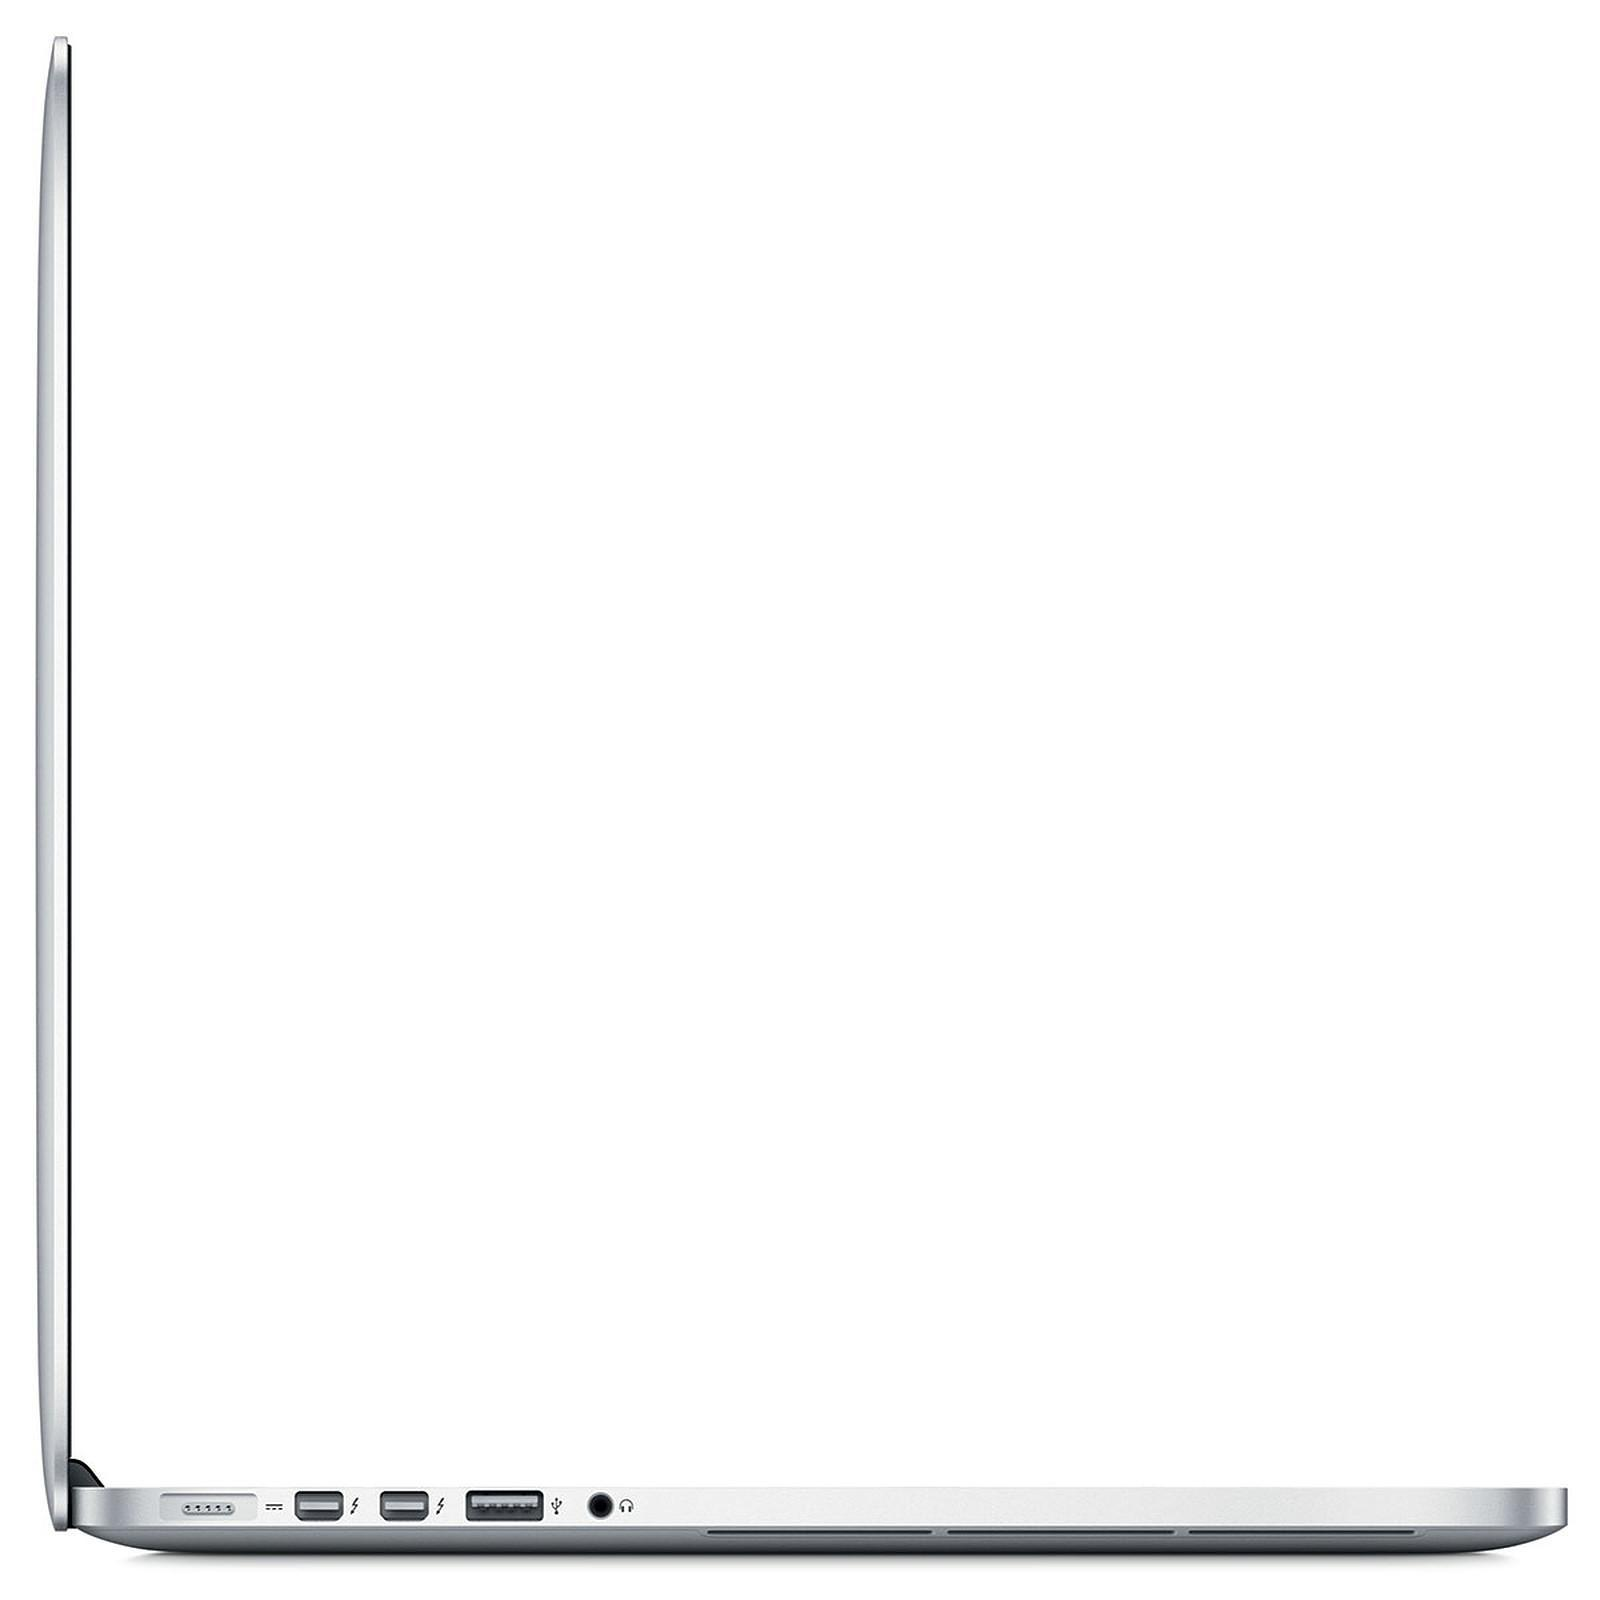 MacBook Pro Retina 15.4-inch (2015) - Core i7 - 16GB - SSD 1000 GB QWERTY